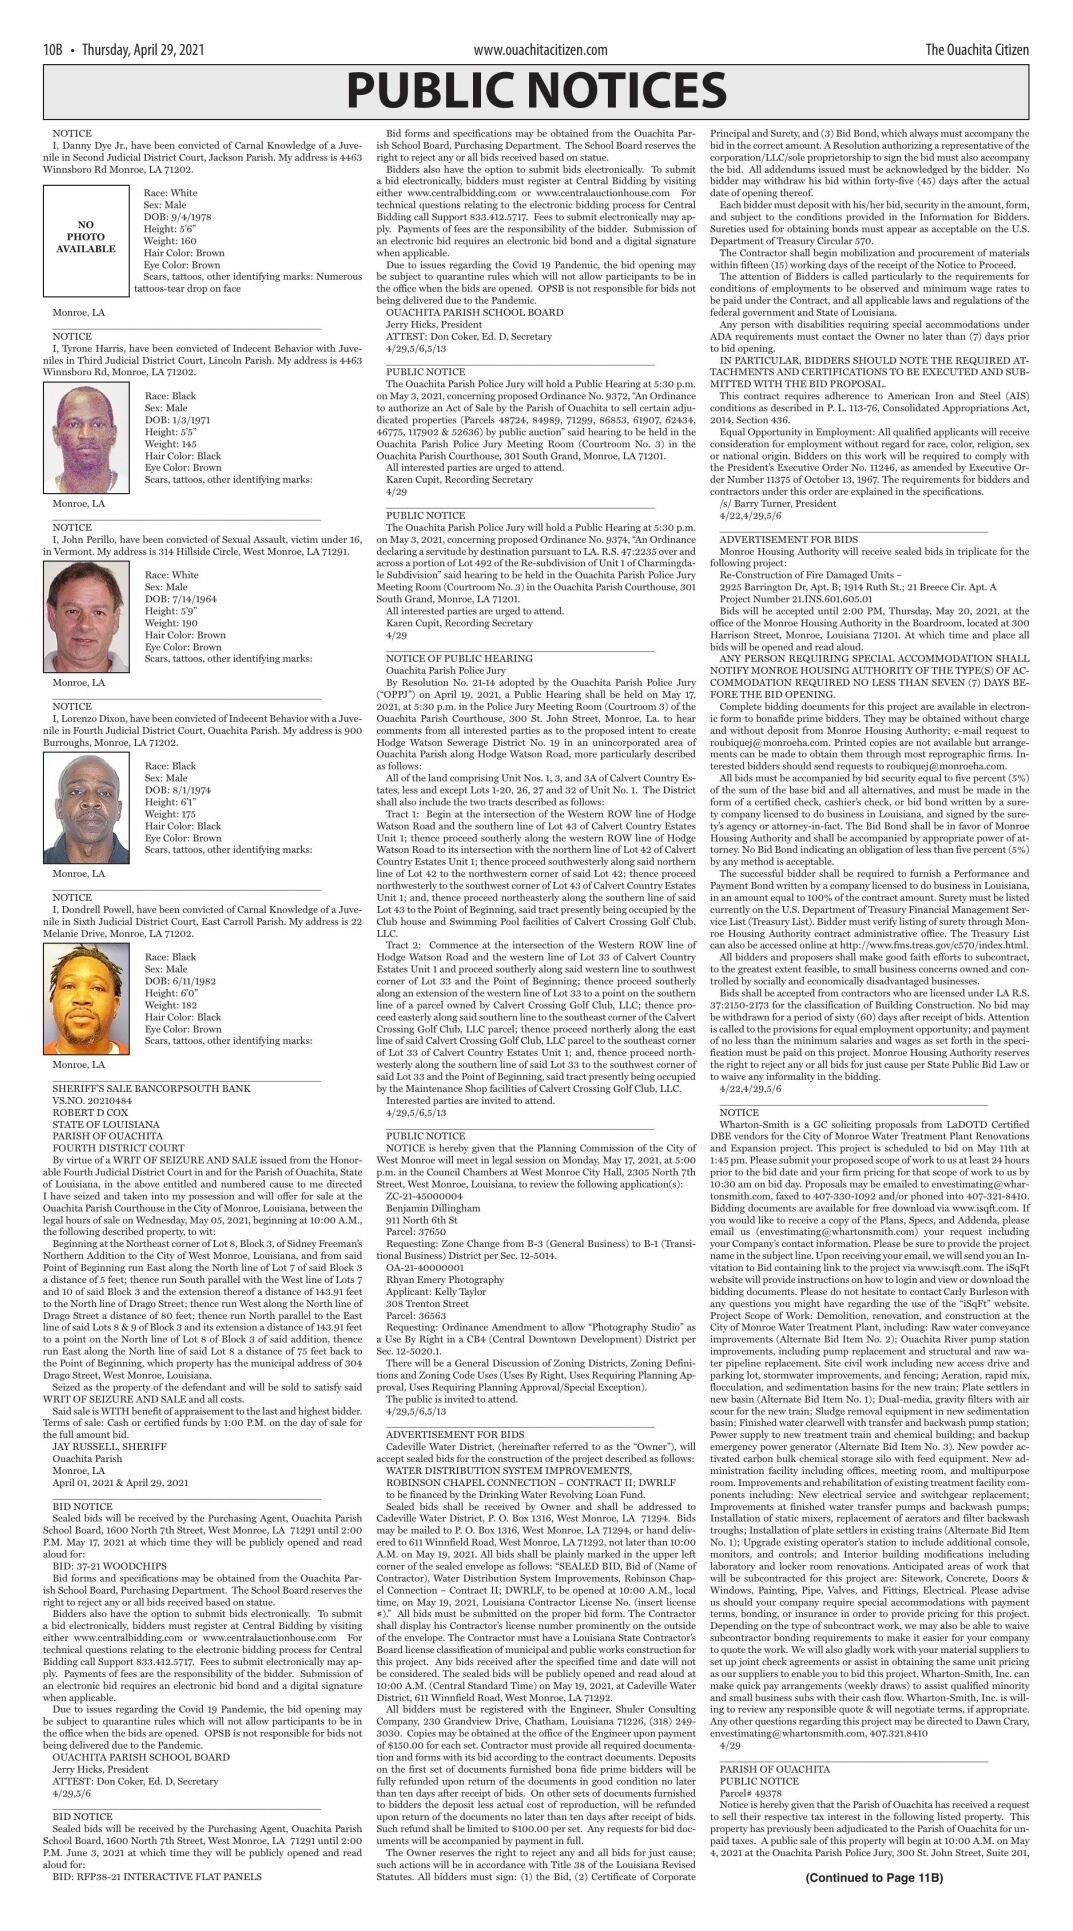 April 29, 2021 Public Notices, click to download pages